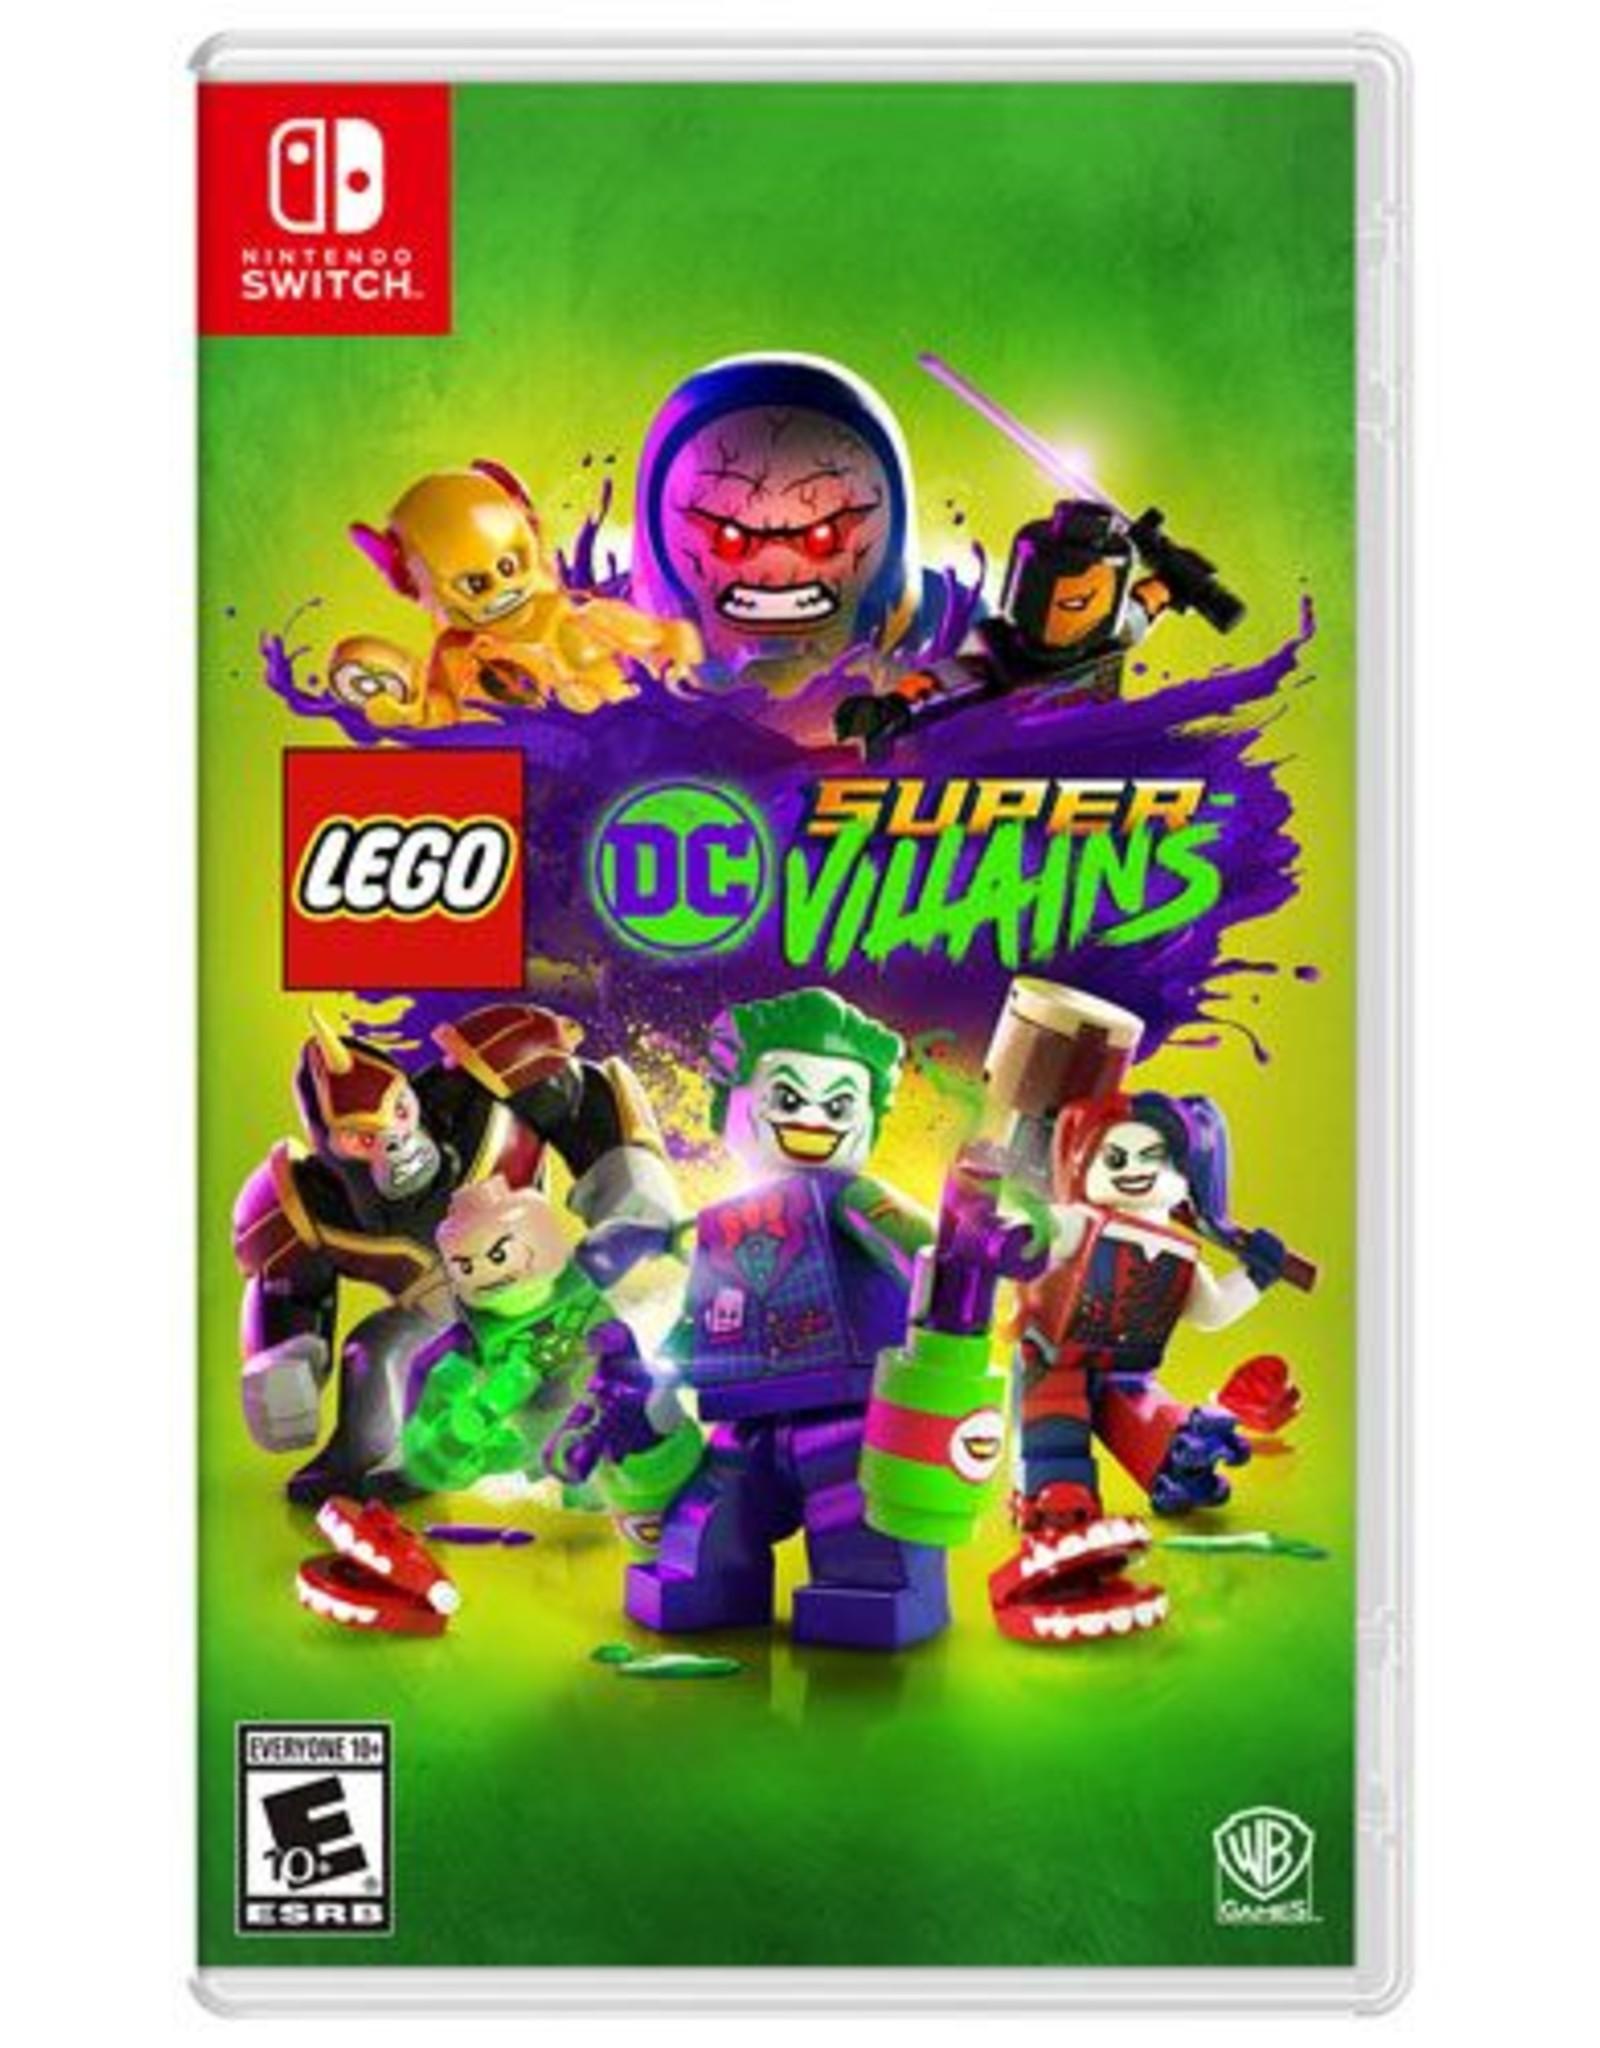 LEGO DC Super Villains - SWITCH PrePlayed